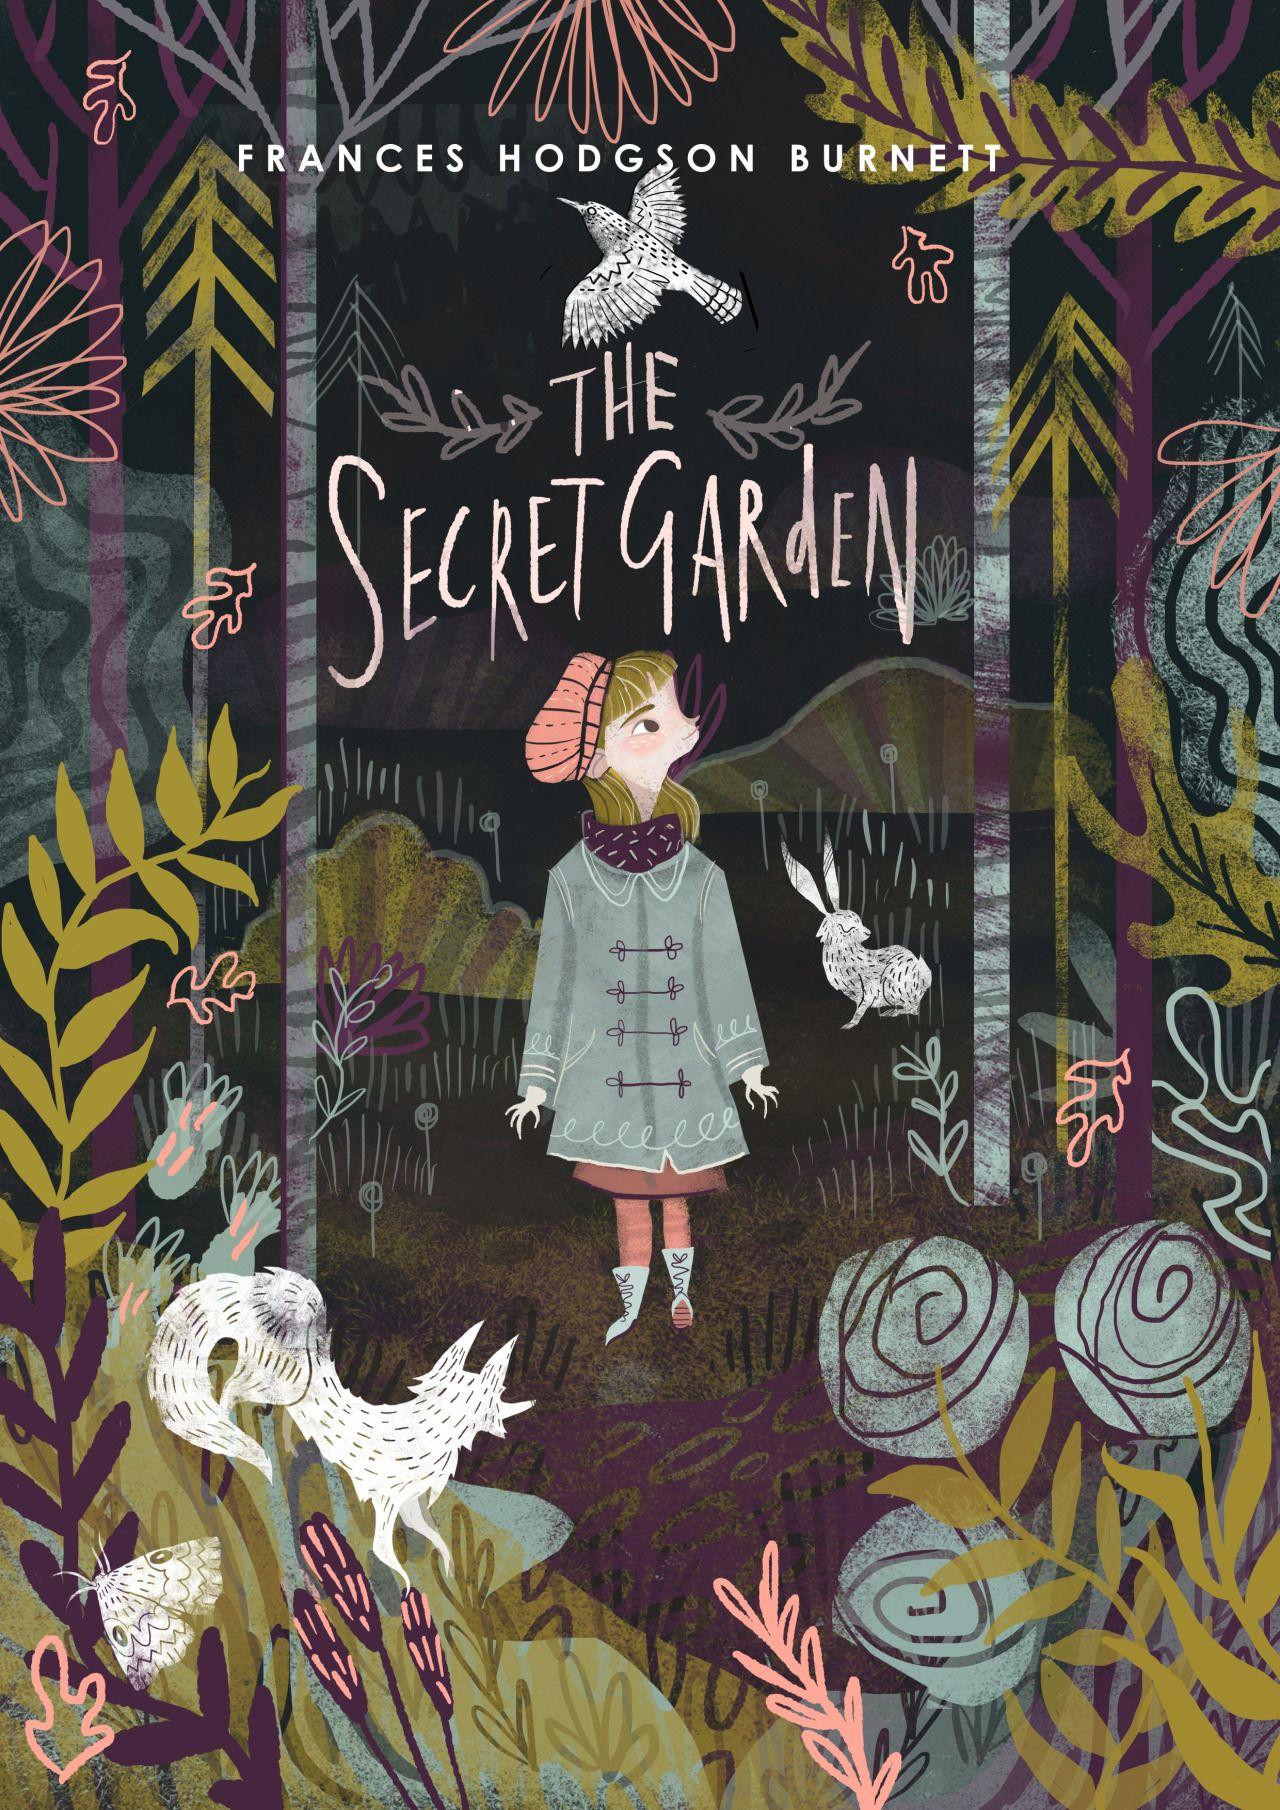 The Secret Garden book cover design By Karl James